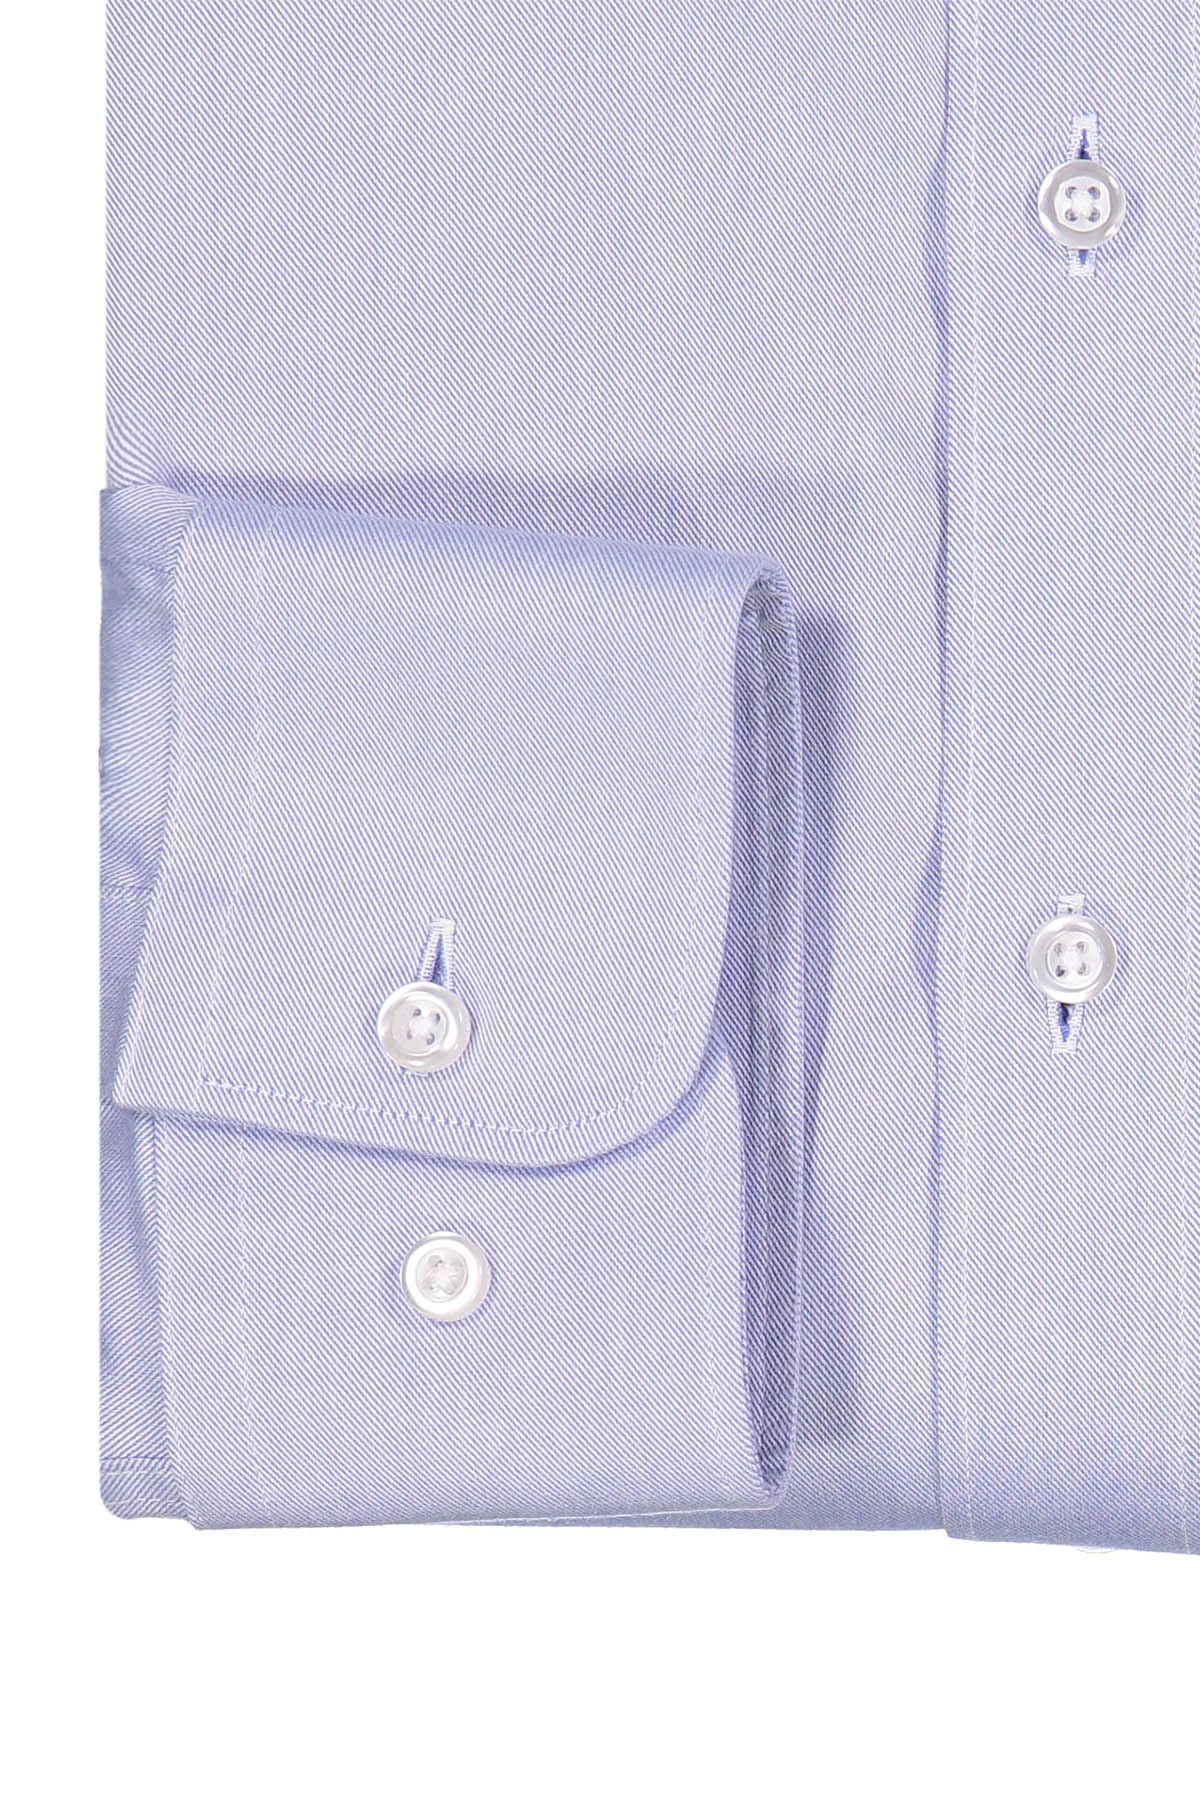 Camisa Calderoni -Non Iron 24/7- twill celeste liso.